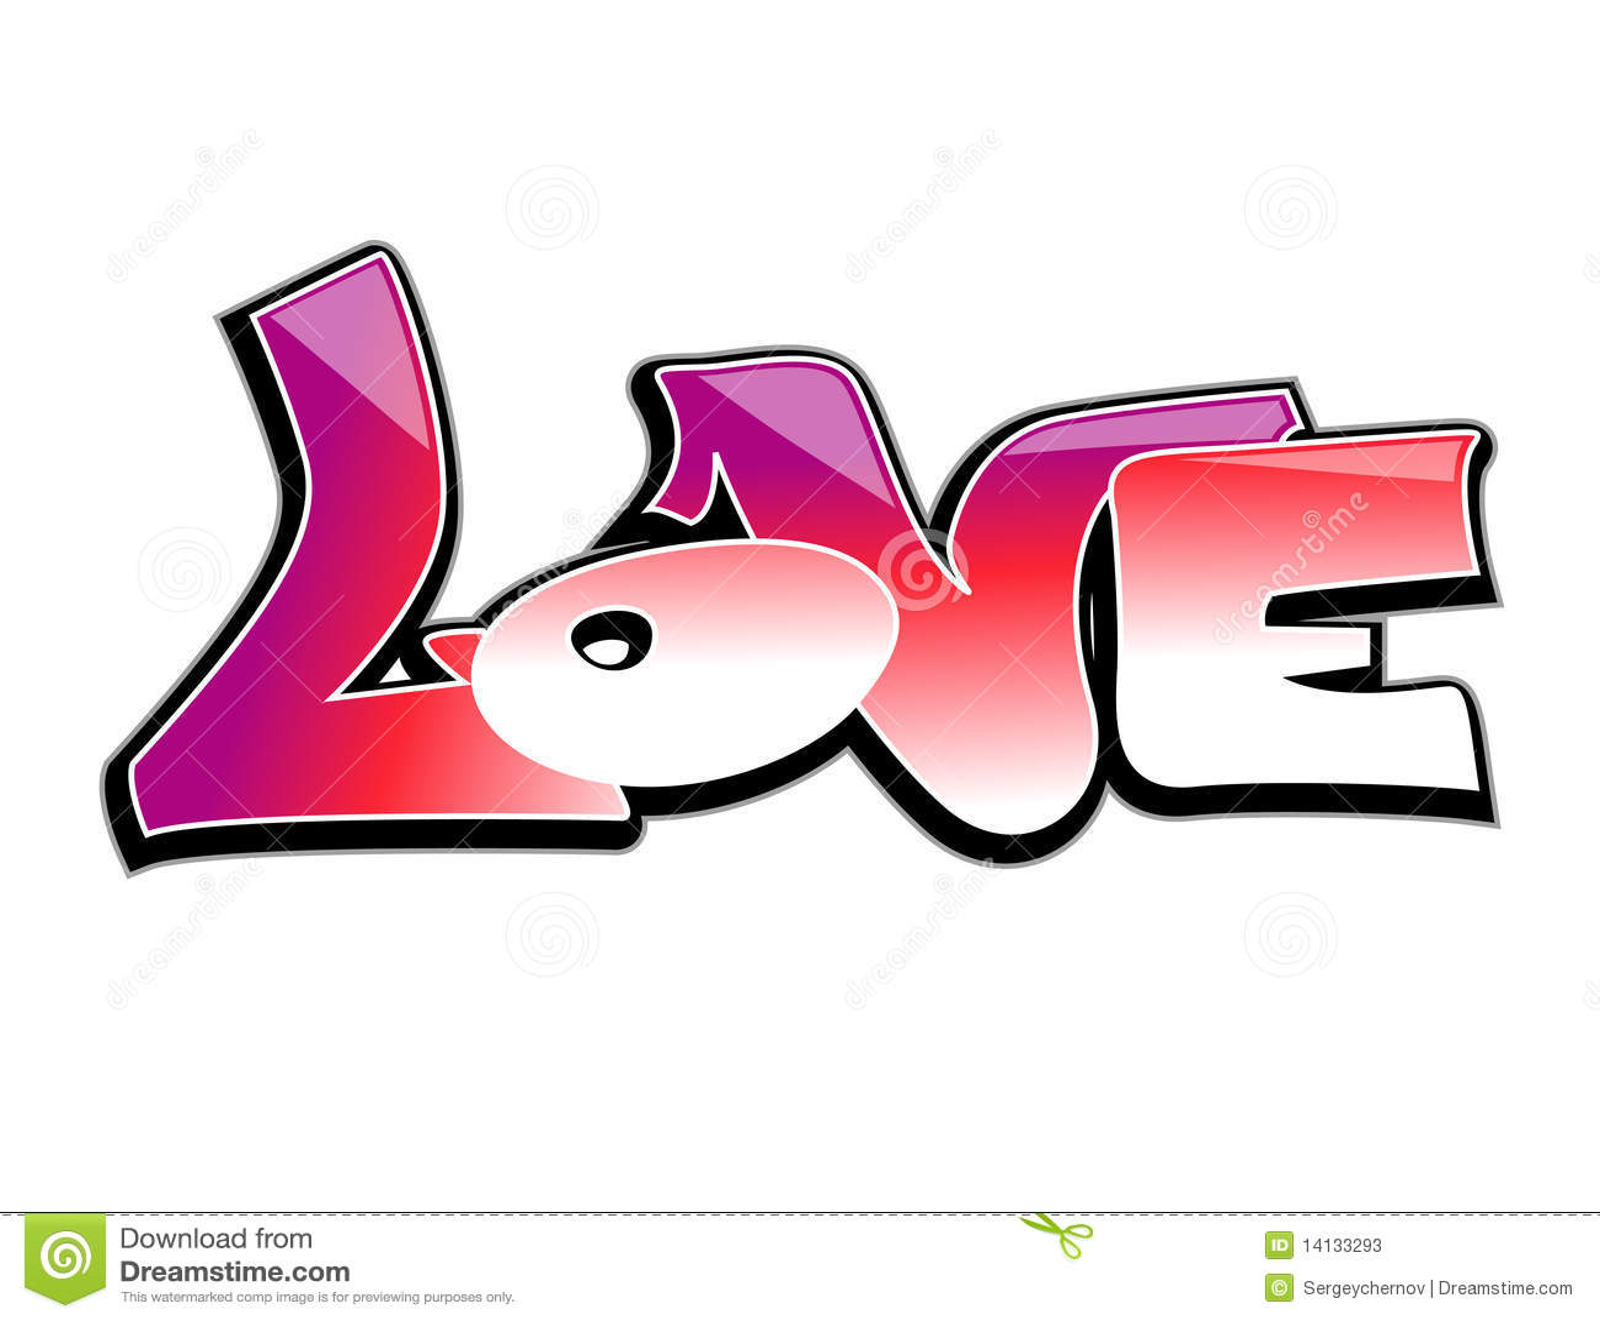 Graffiti art designs - Art Design Graffiti Illustration